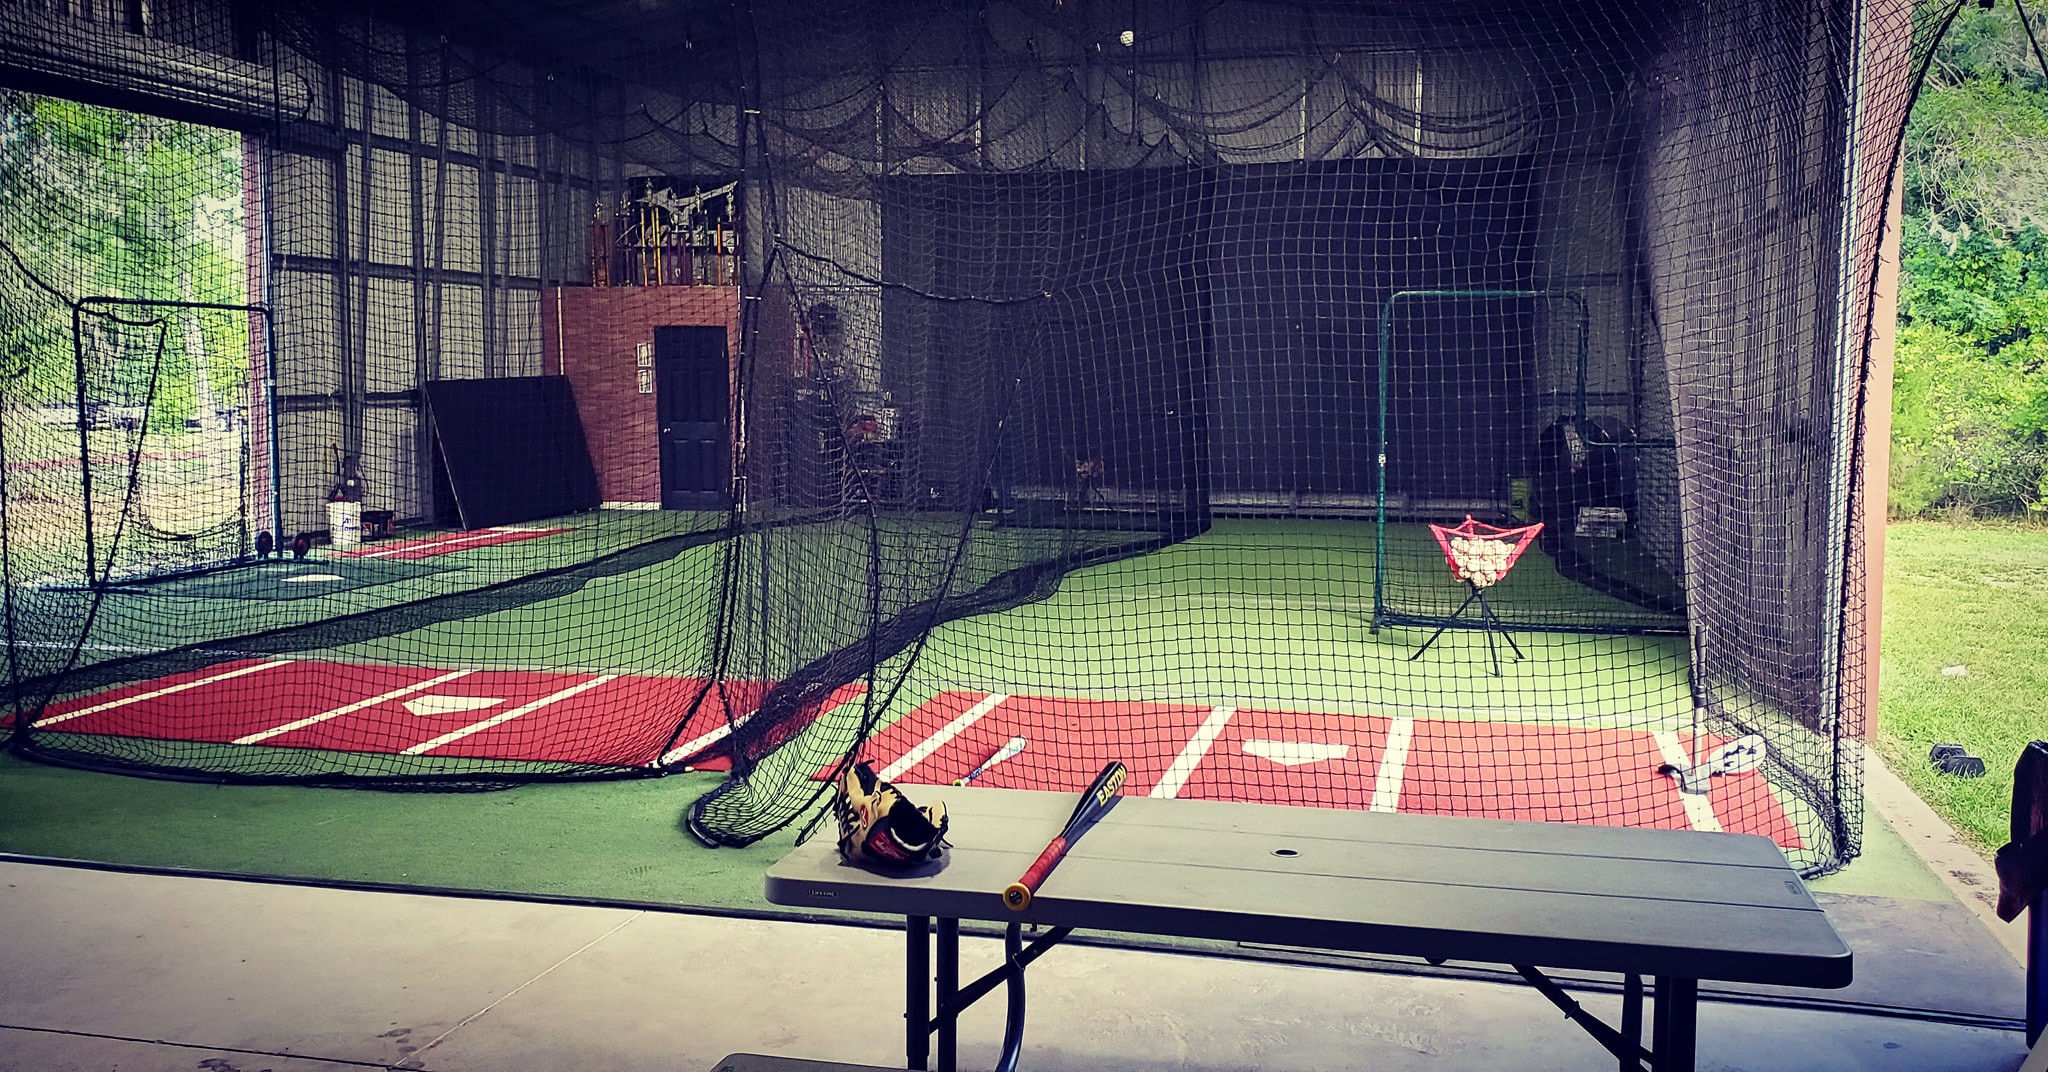 Bono Baseball Cages